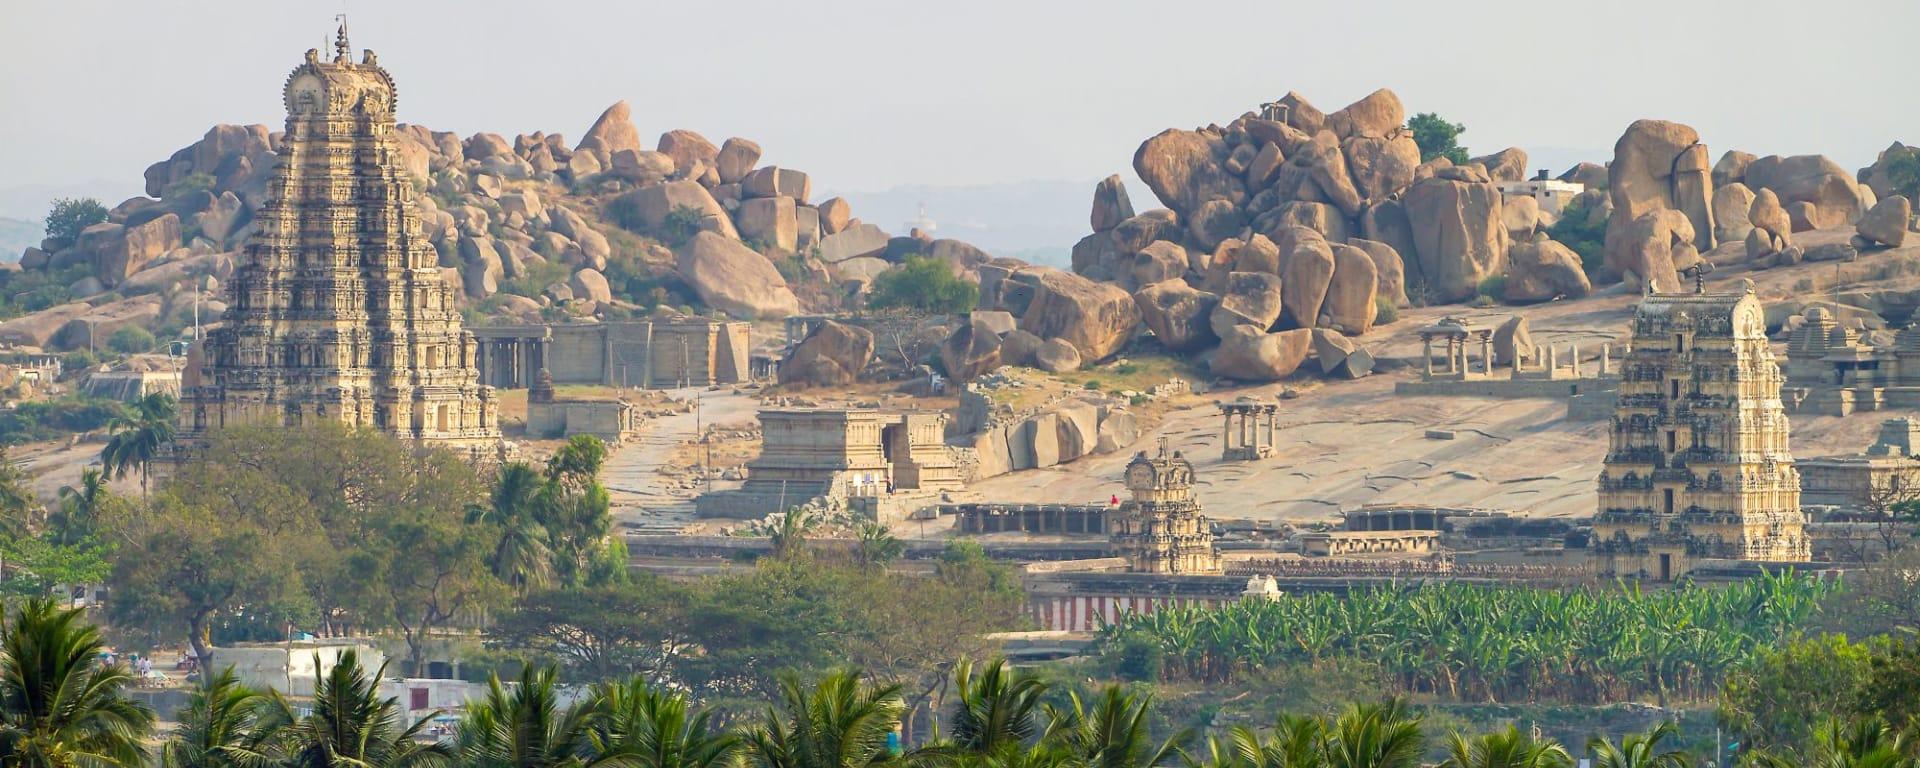 «The Deccan Odyssey» - Die Juwelen des Dekkans ab Mumbai: Virupaksha Temple in Hampi